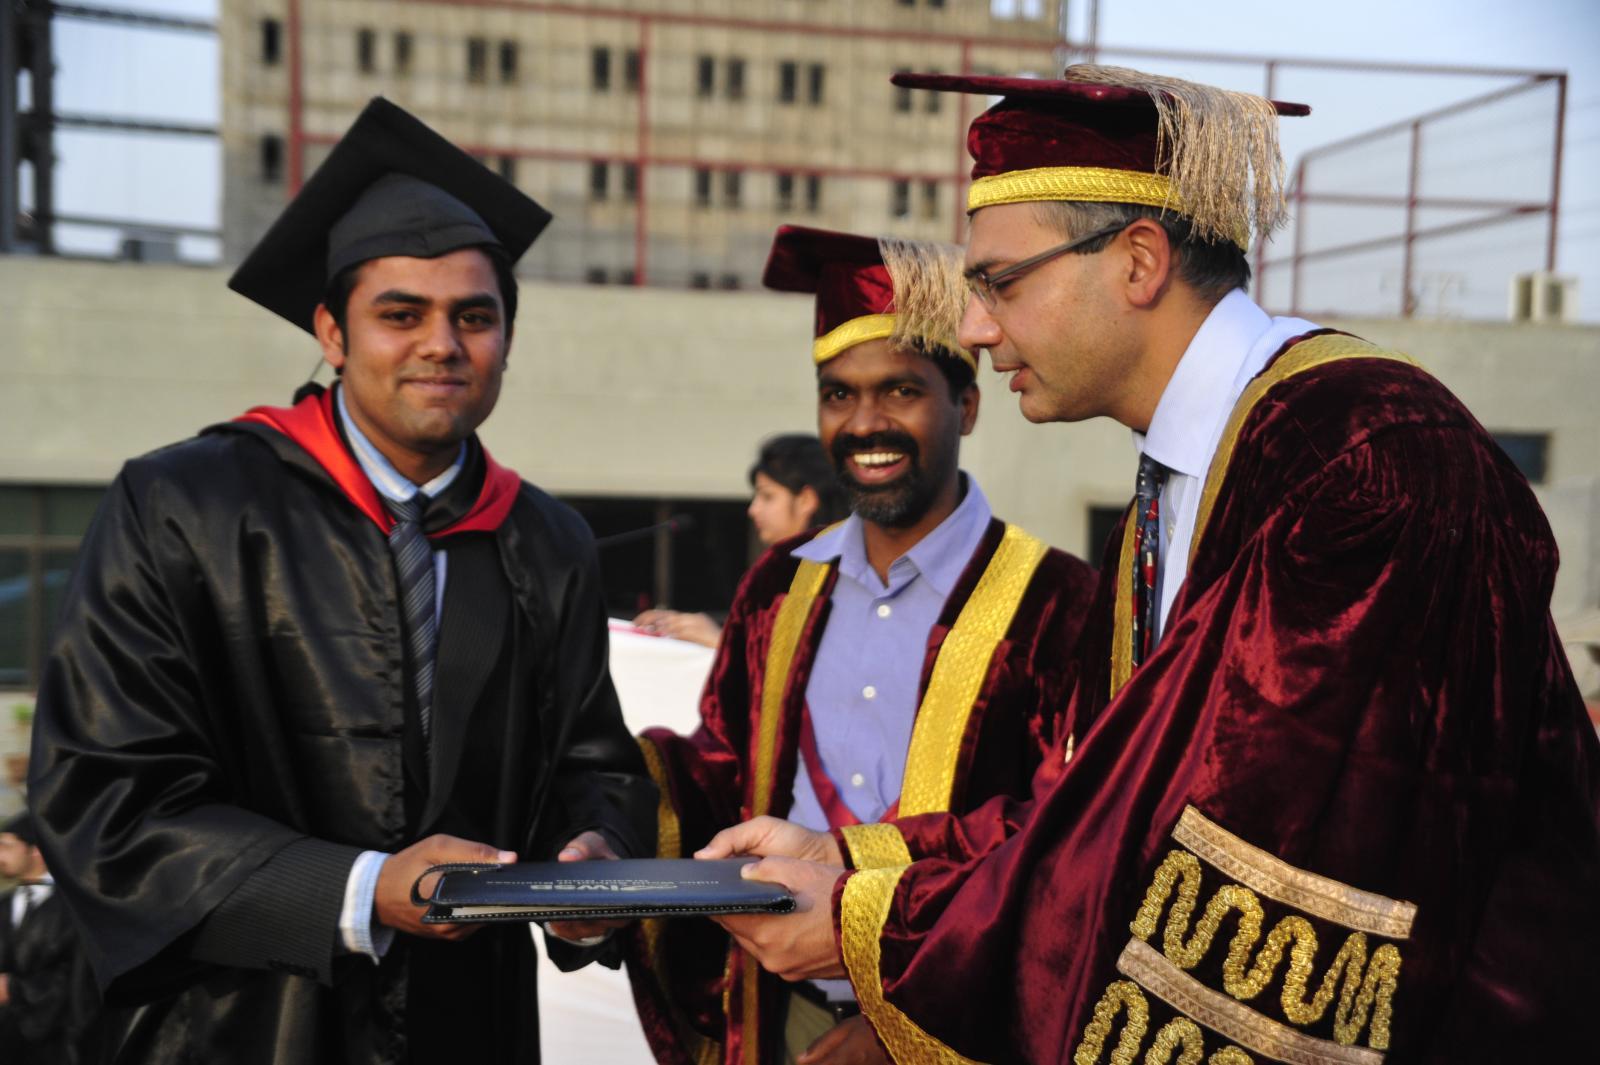 Saurabh receiving the degree